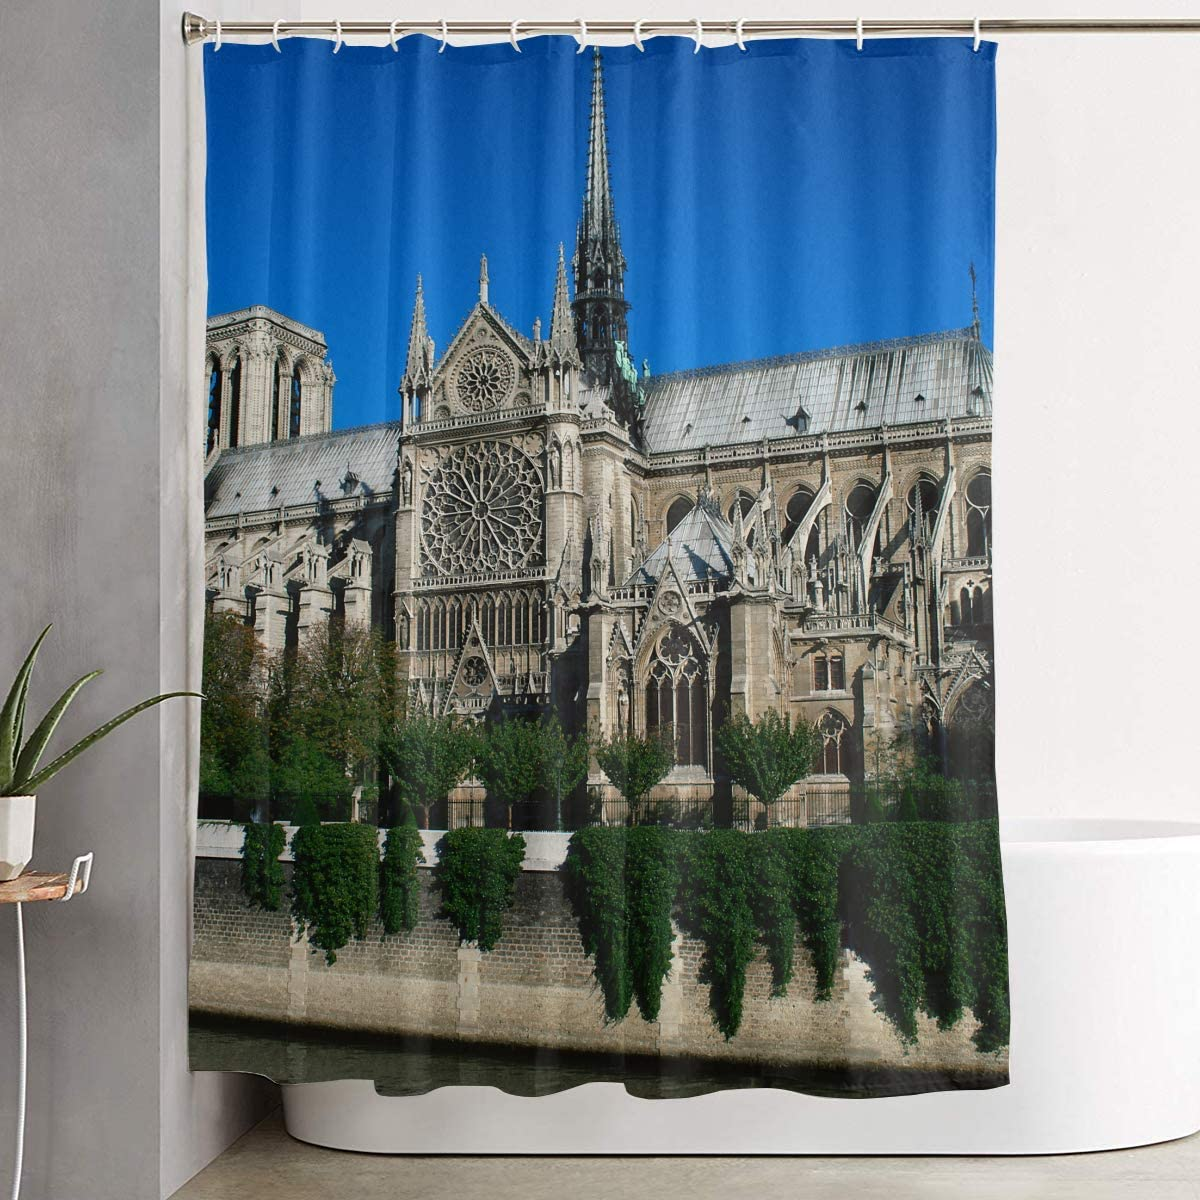 Pooizsdzzz Bathroom Shower Curtain Notre Dame Cathedral Paris Home Decor Shower Curtains with Hooks 60 X 72